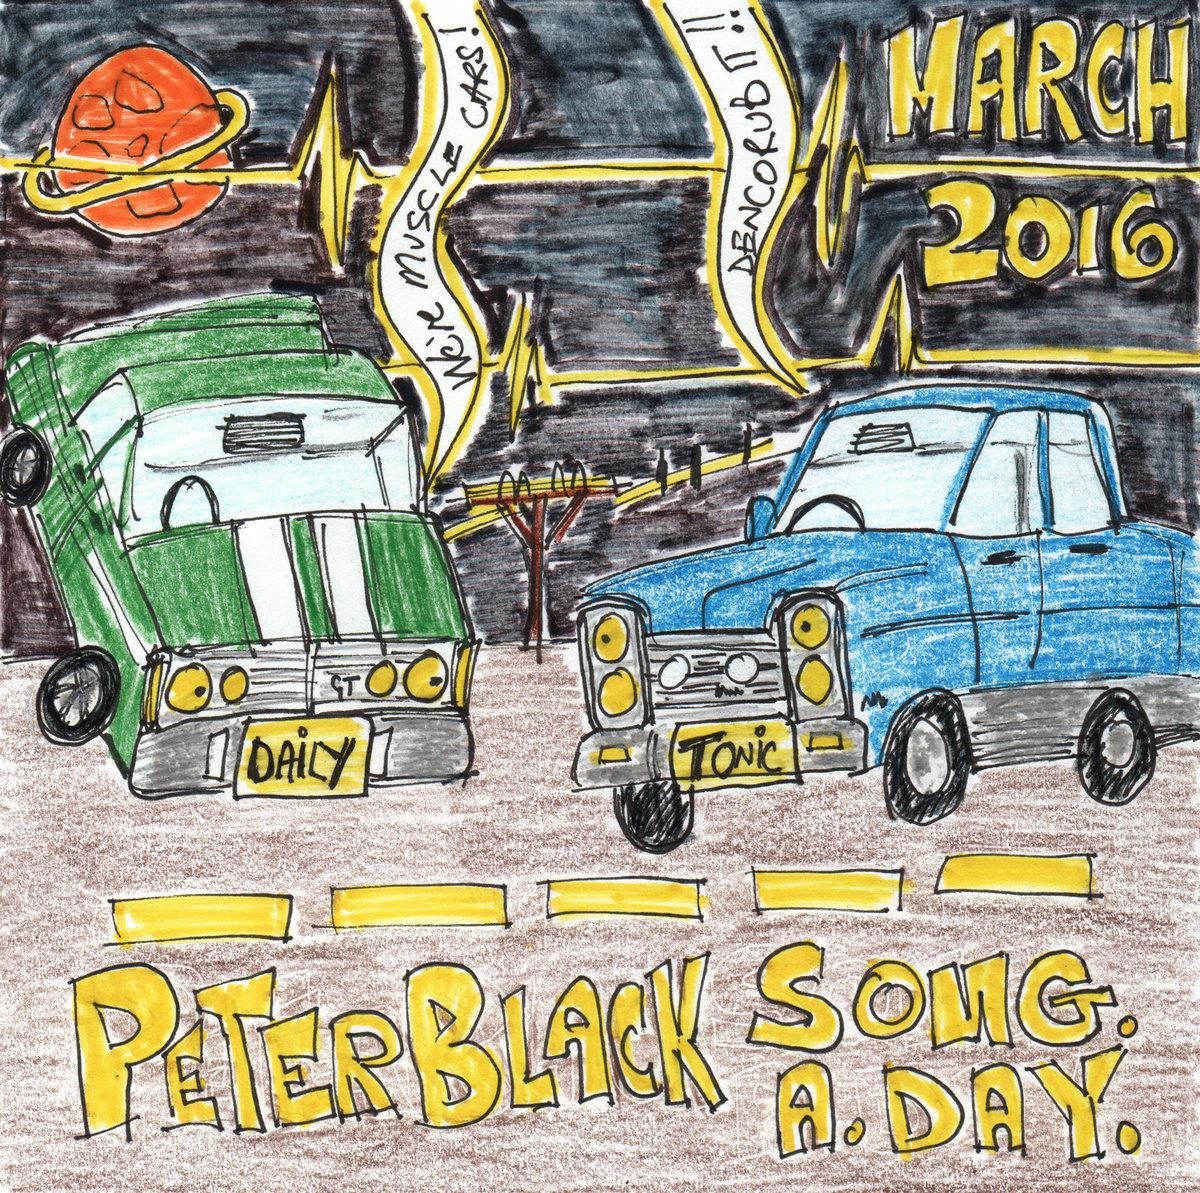 Peter Blackie Black March SAD 2016